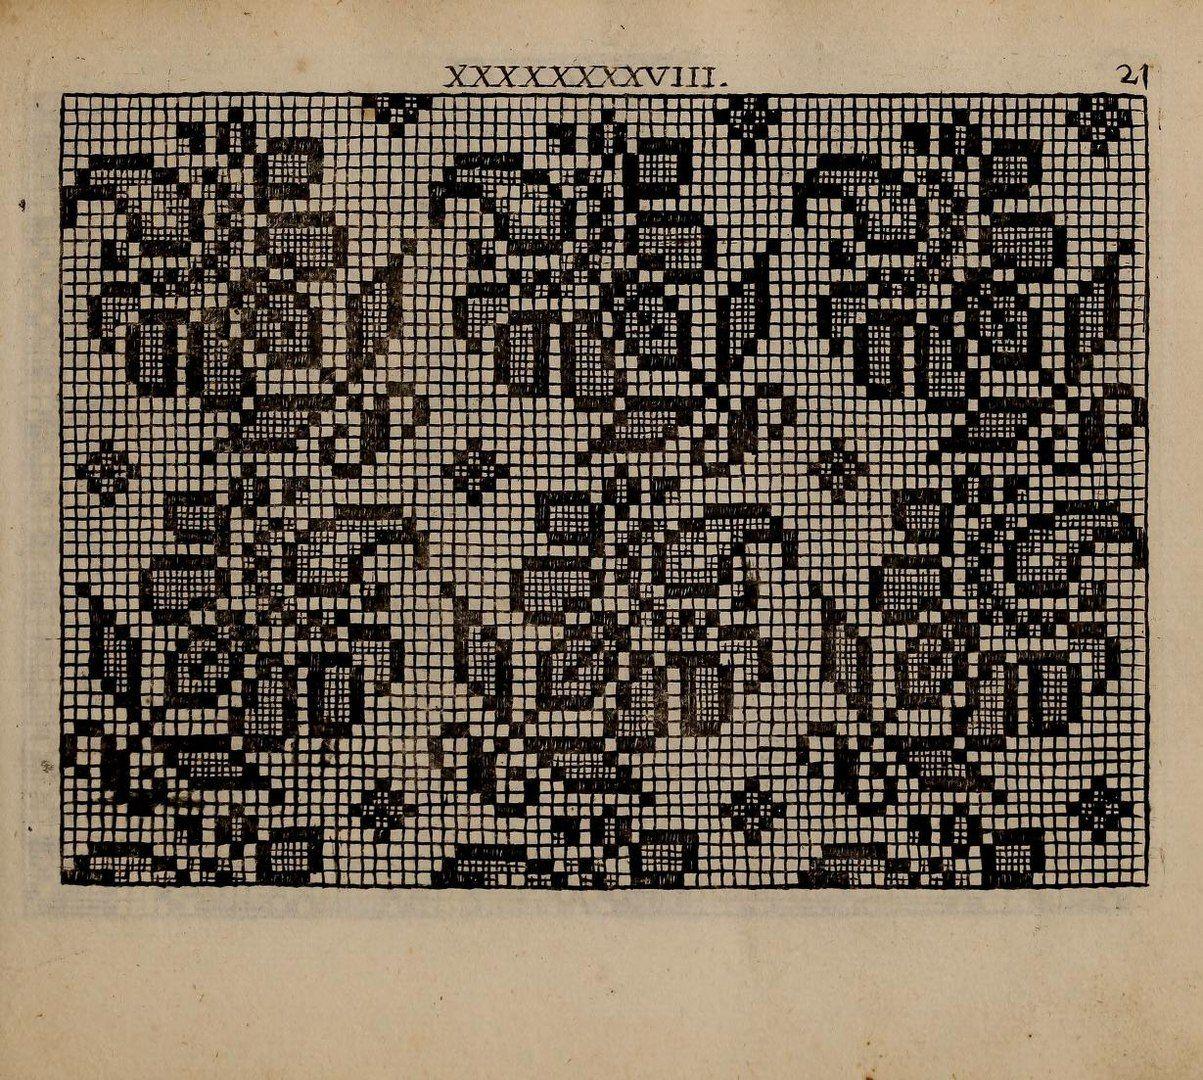 oTFnf-koyDw.jpg (1203×1080)